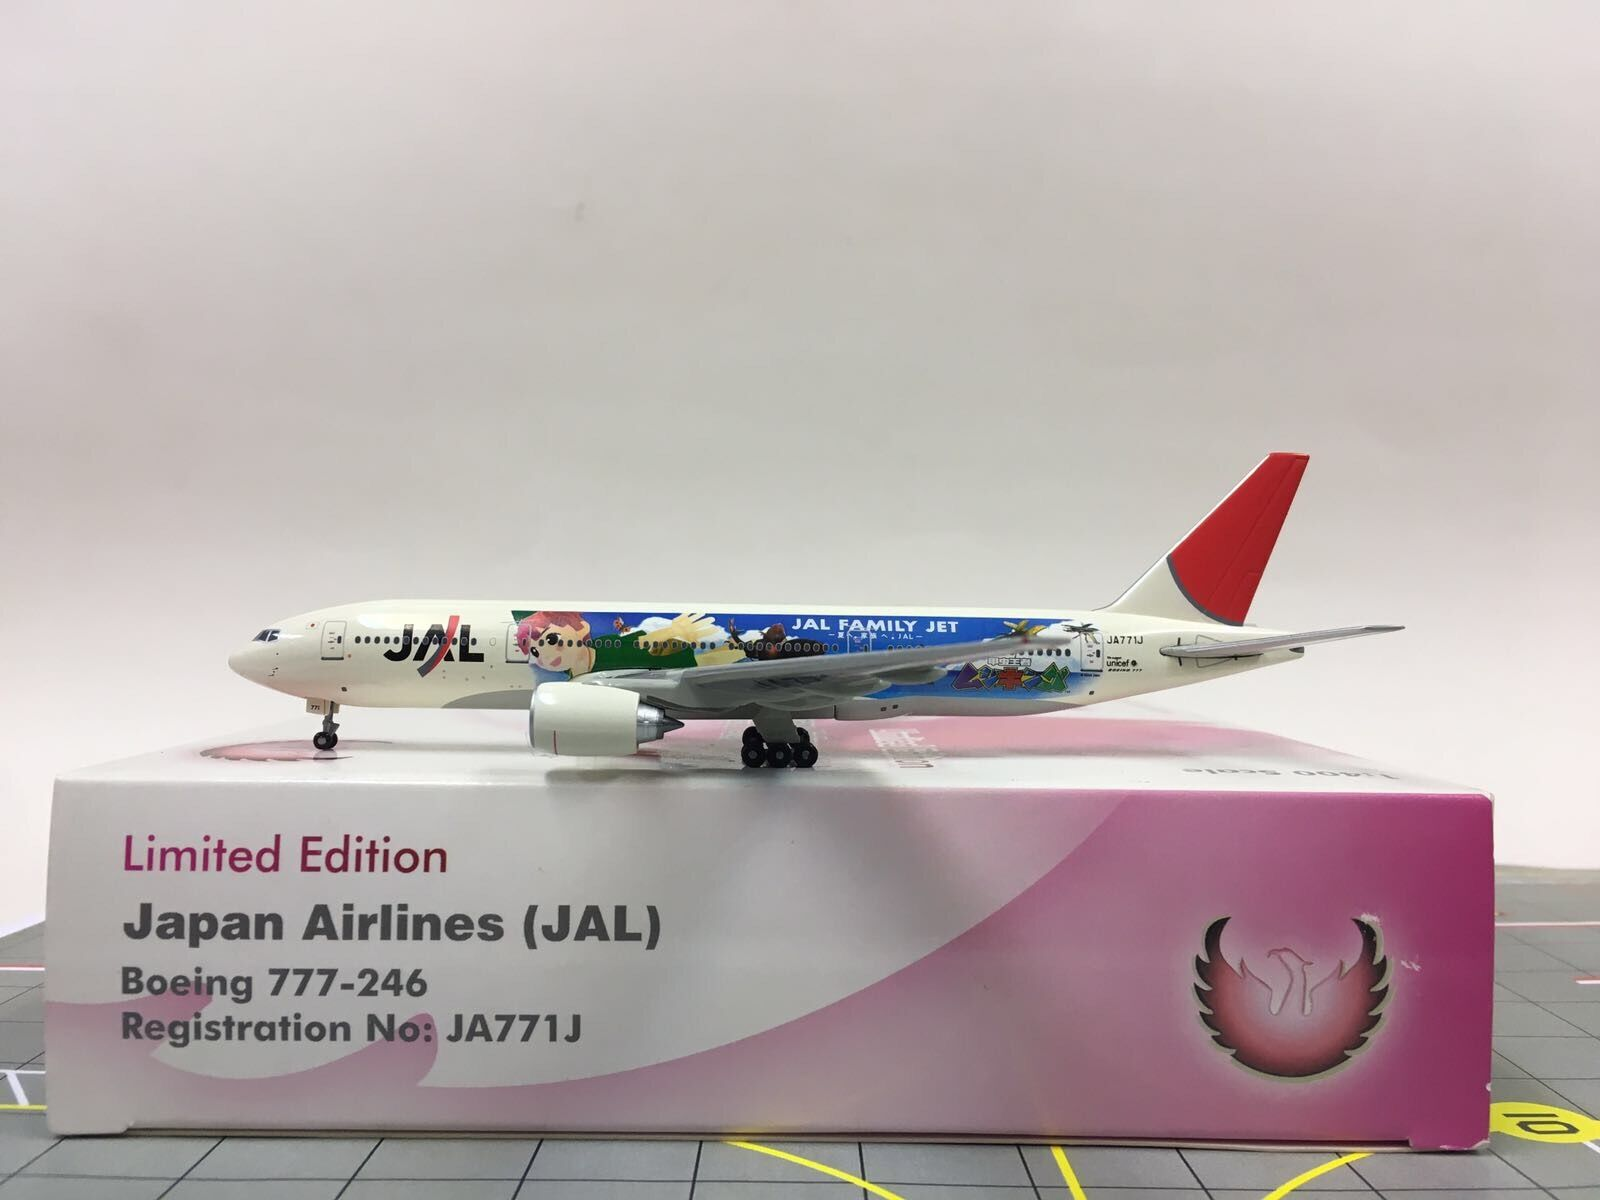 Limited edition phoenix 1 400 jal japan airlines - boeing 777-246 ja771j